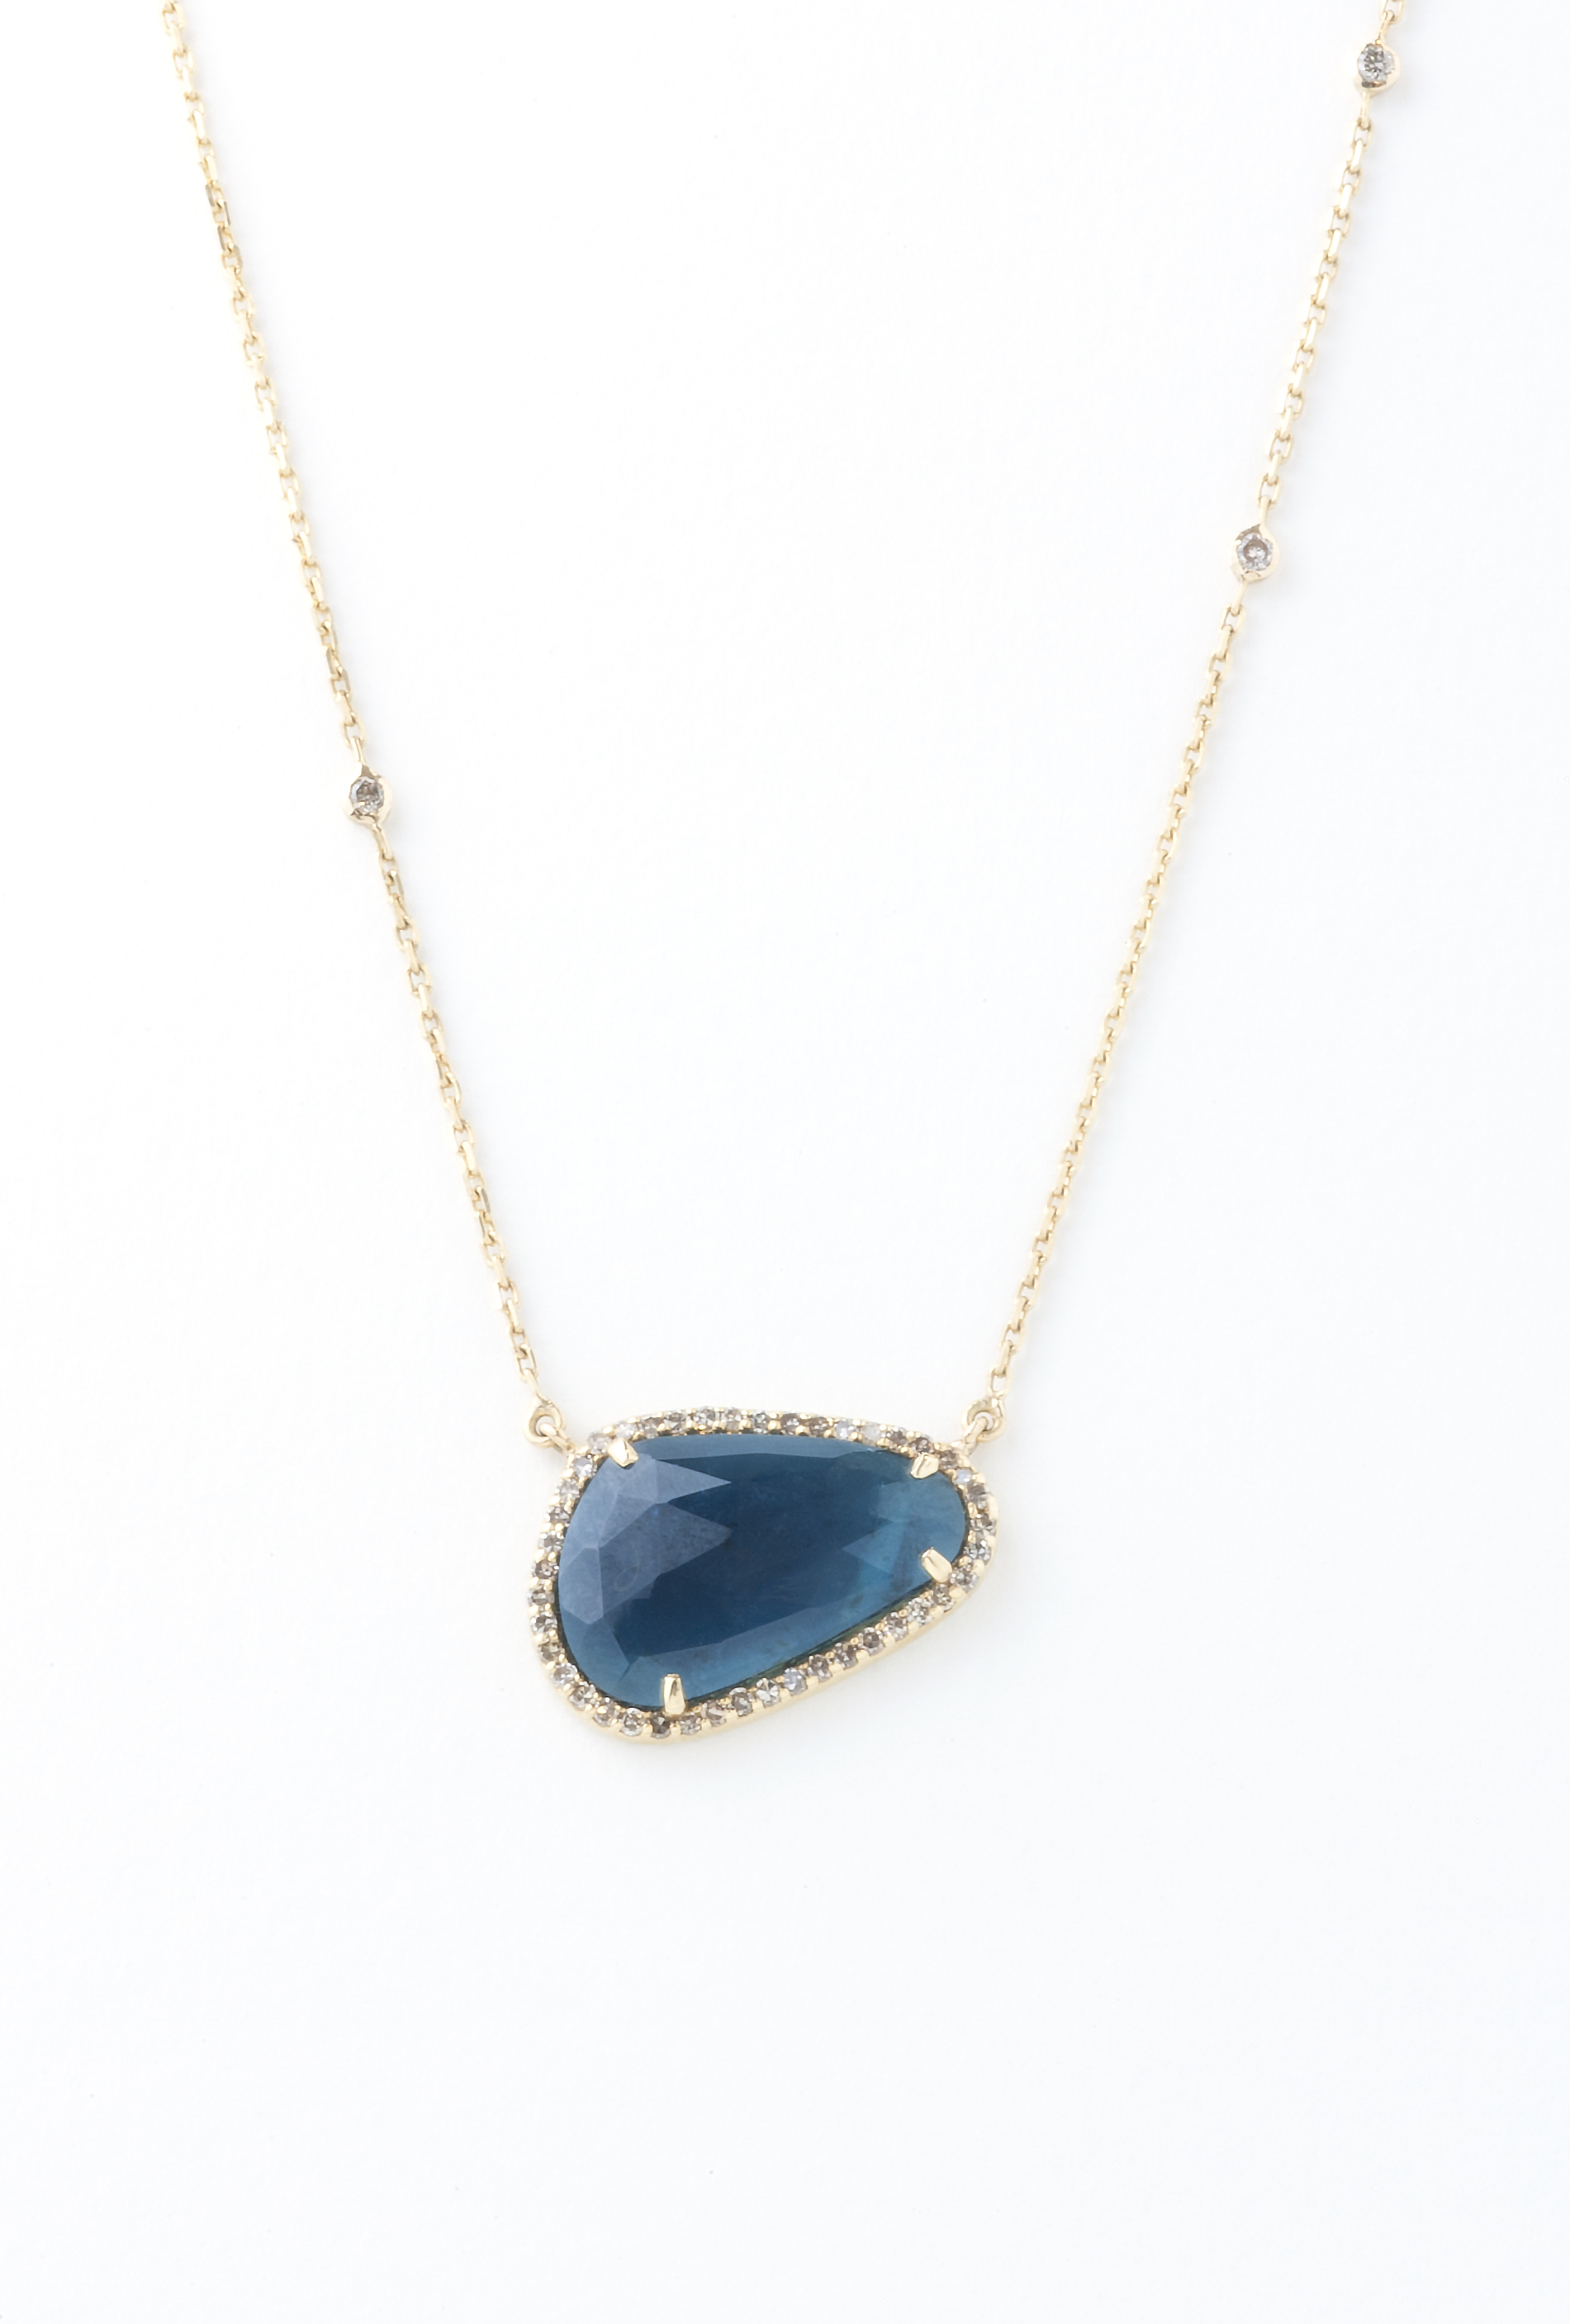 Turmaline and Diamond pendent